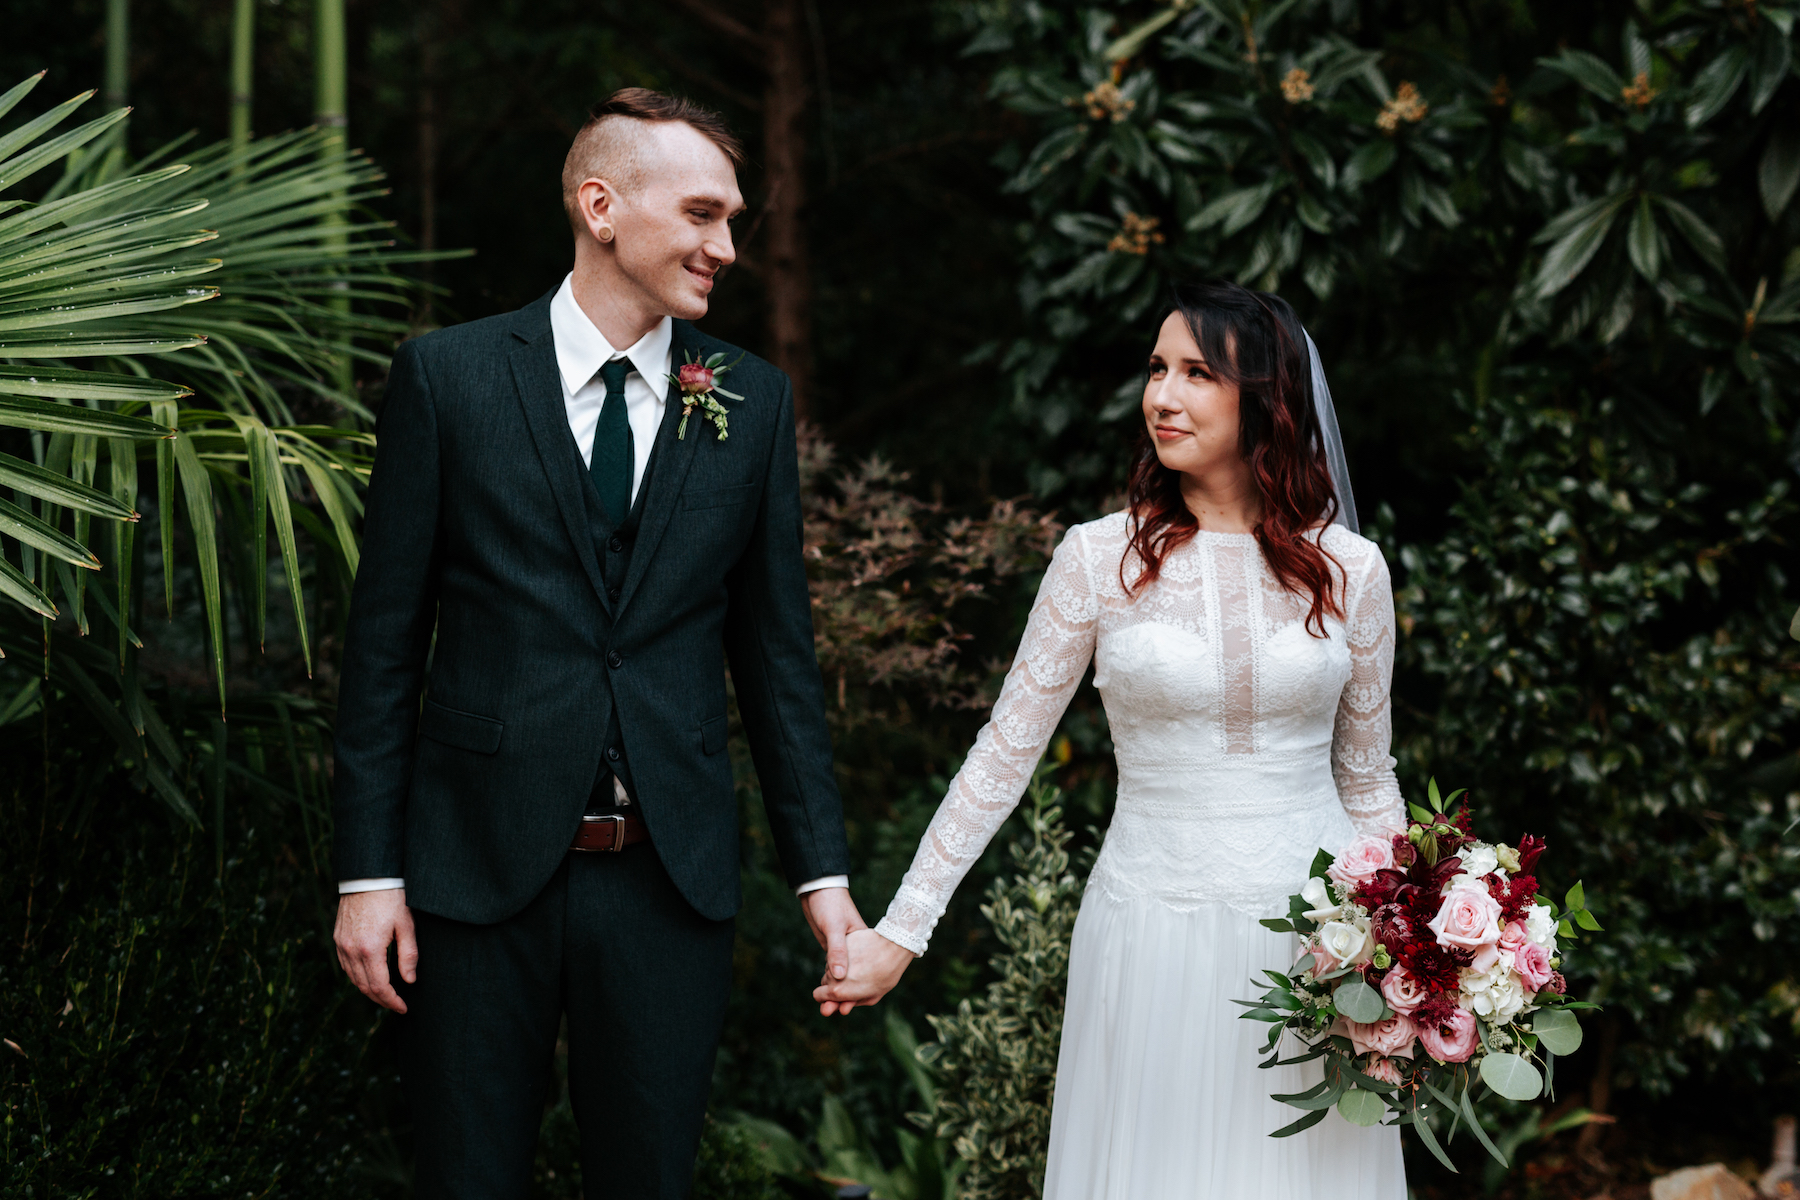 South-Carolina-Wedding-Engagement-Bridal-Photographer-Columbia-Greenville-Spartanburg-746.JPG